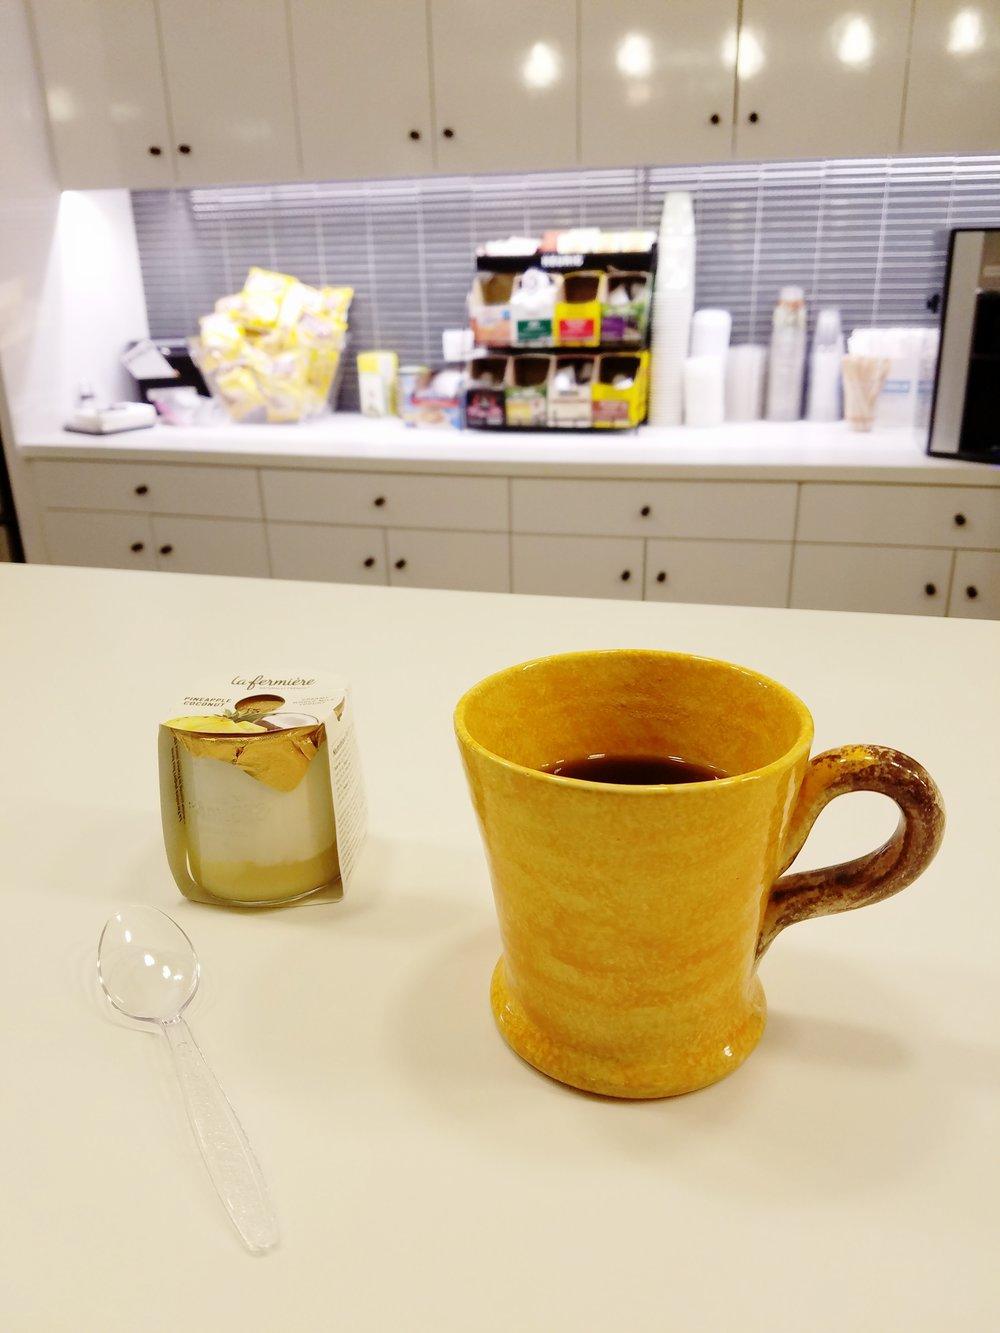 Coffee and Yogurt at The Bistro